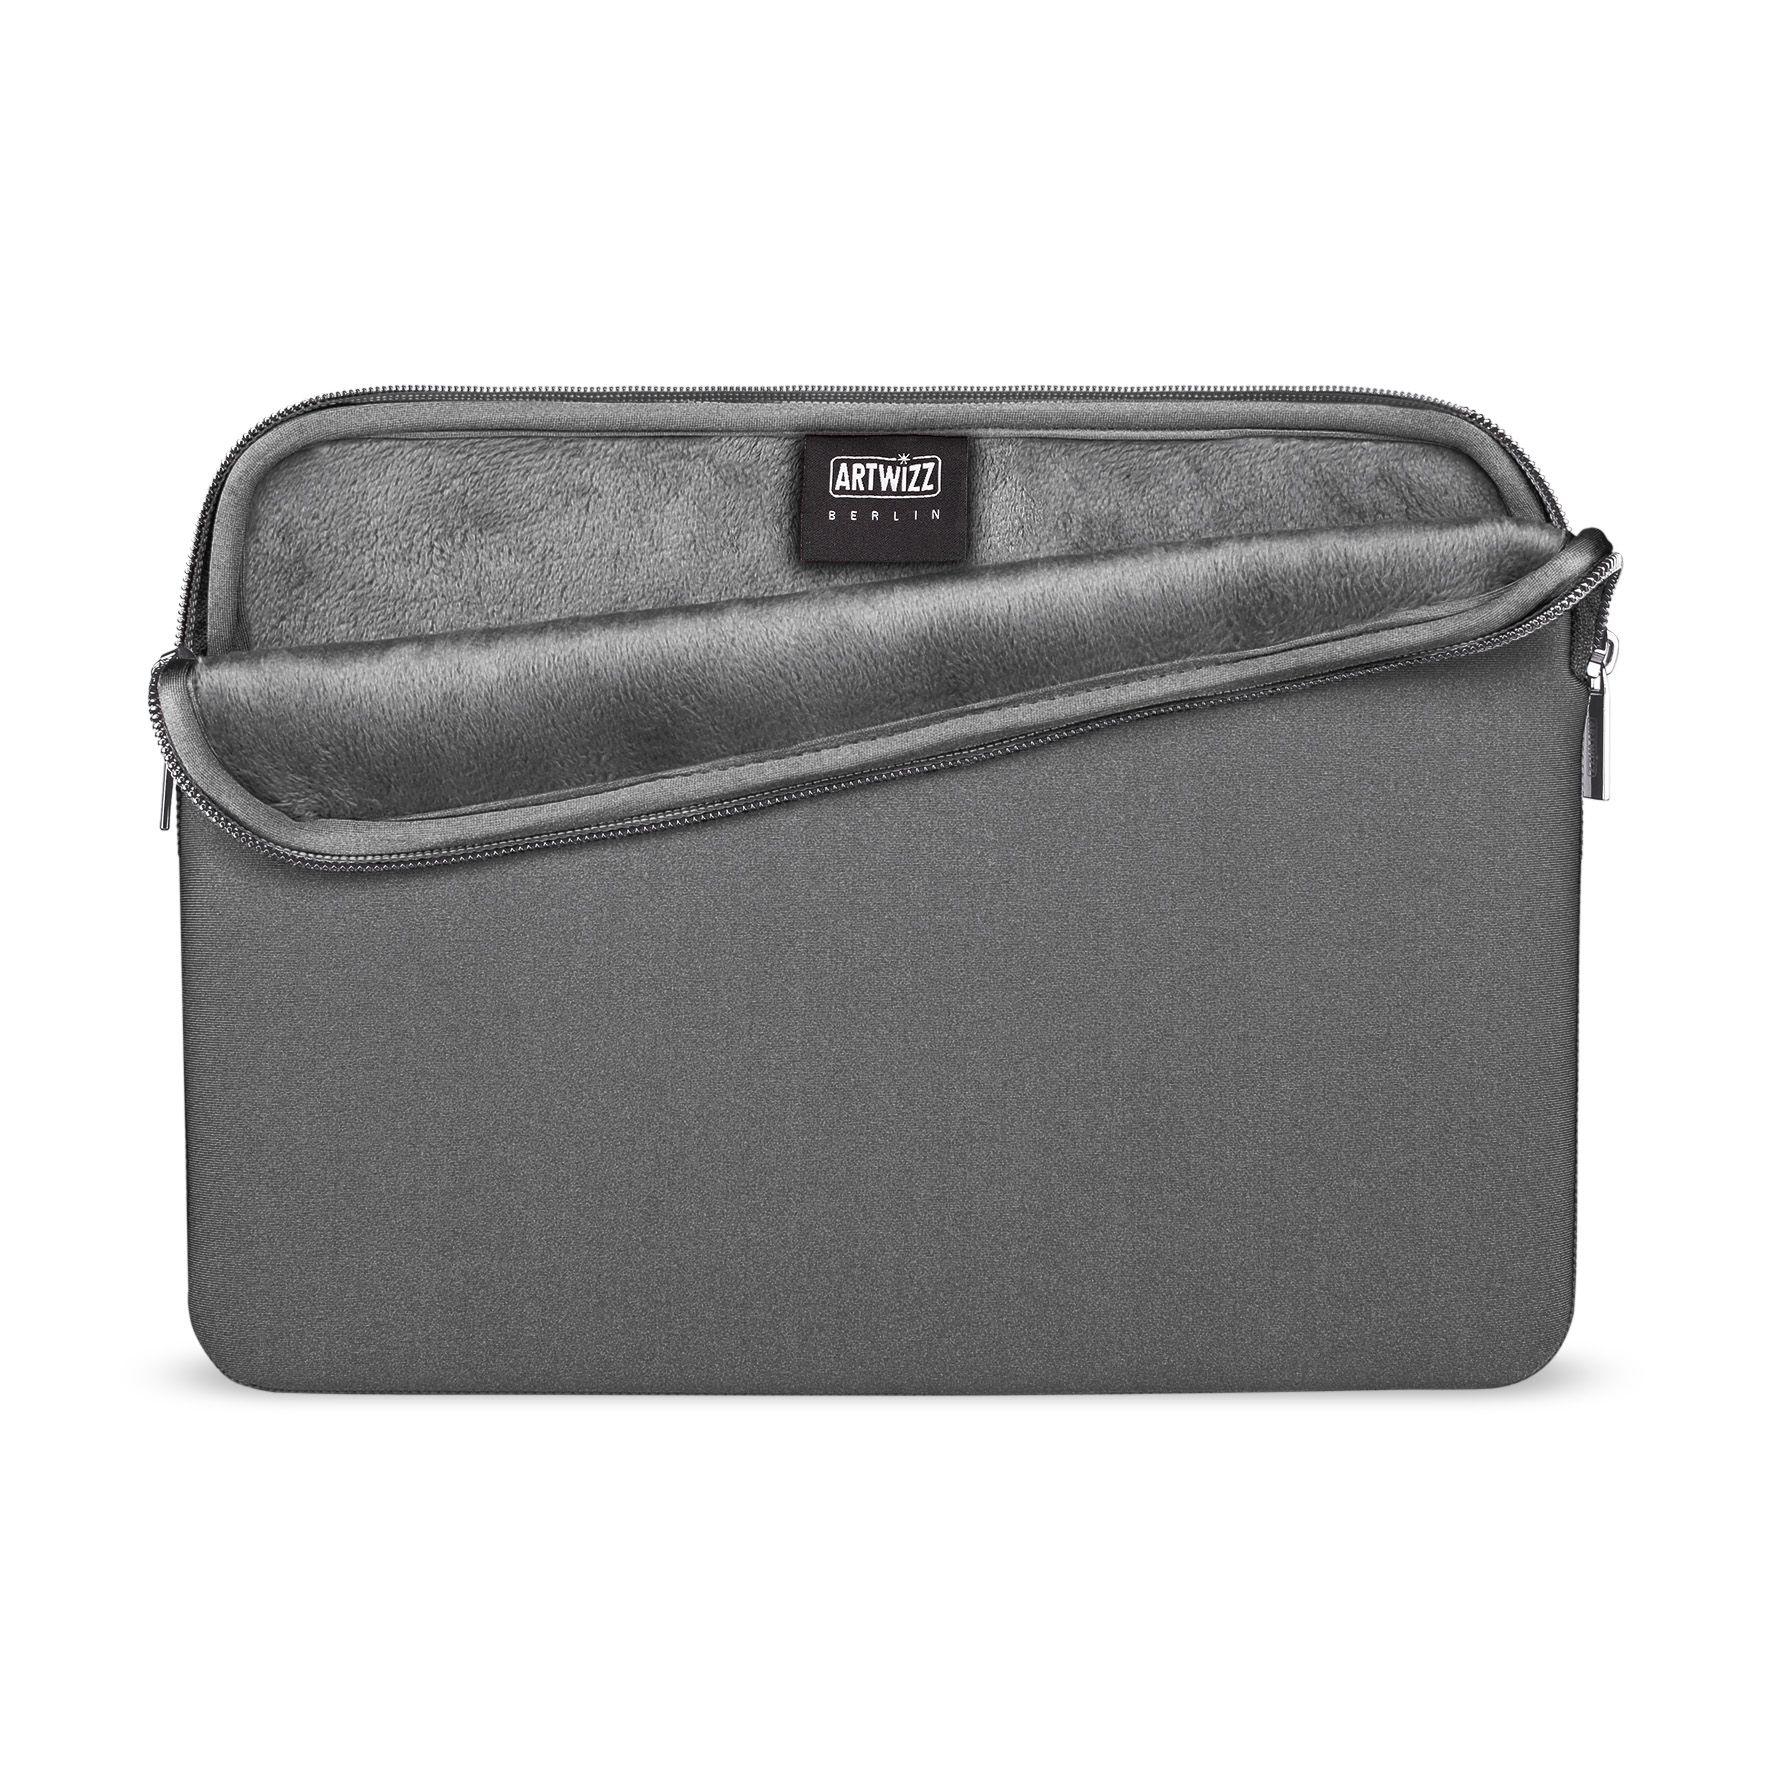 Artwizz Neopren Sleeve für MacBook Pro 15 Zoll - Titan 544809 -  huellendirekt.de